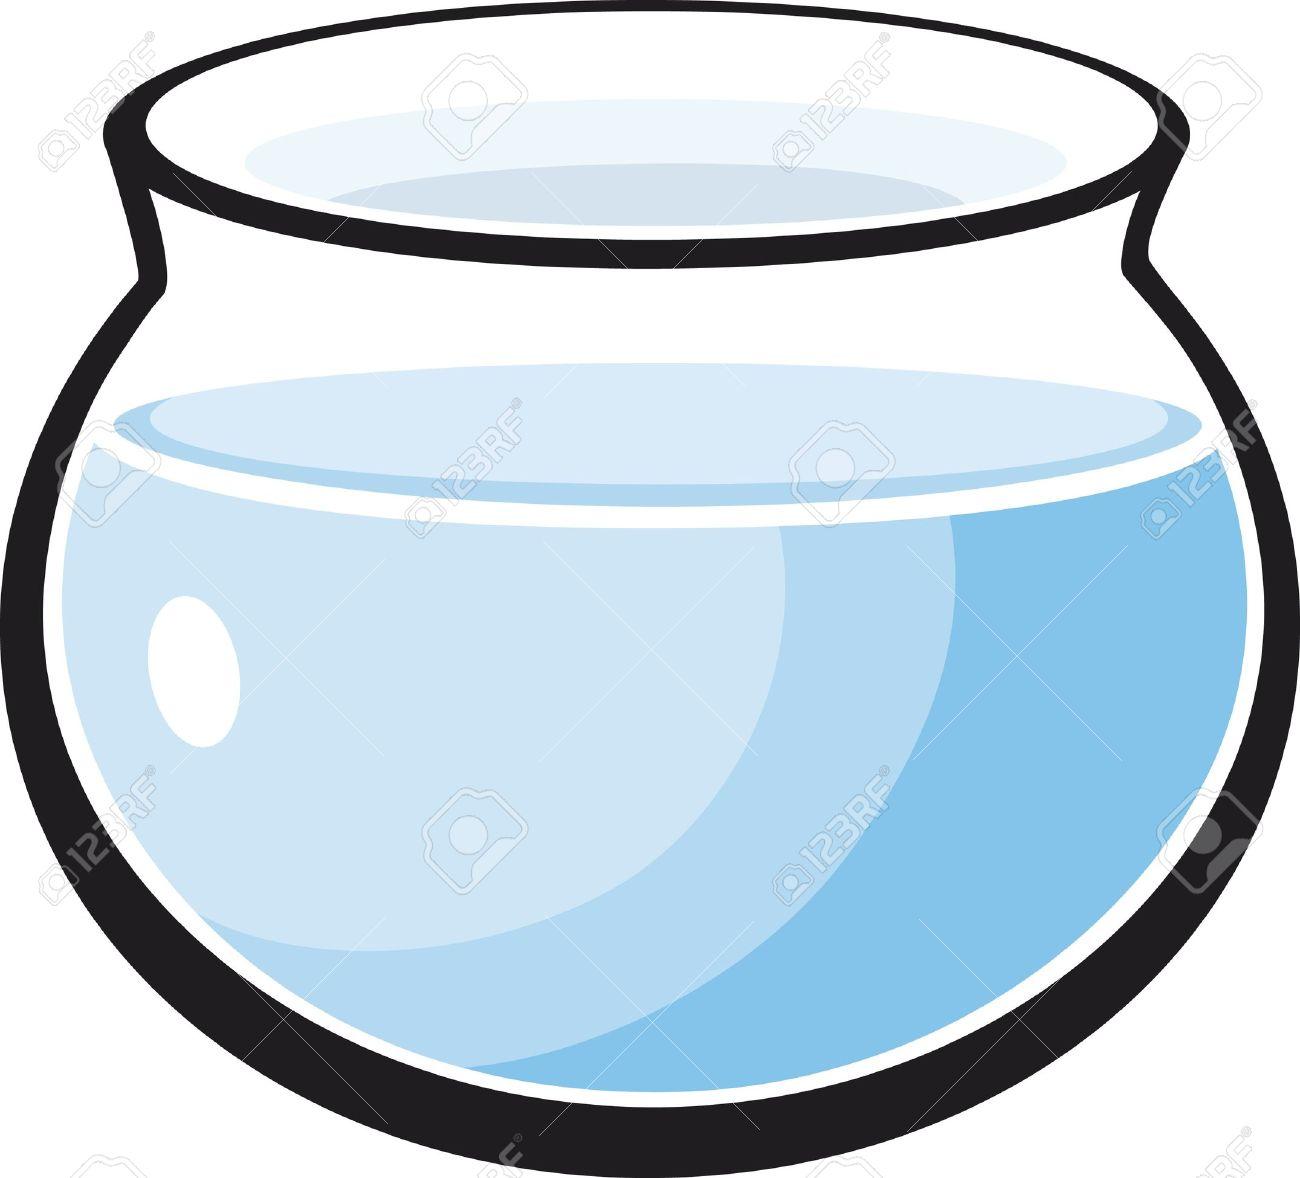 cartoon Illustration of empty fish tank Stock Vector - 10746481